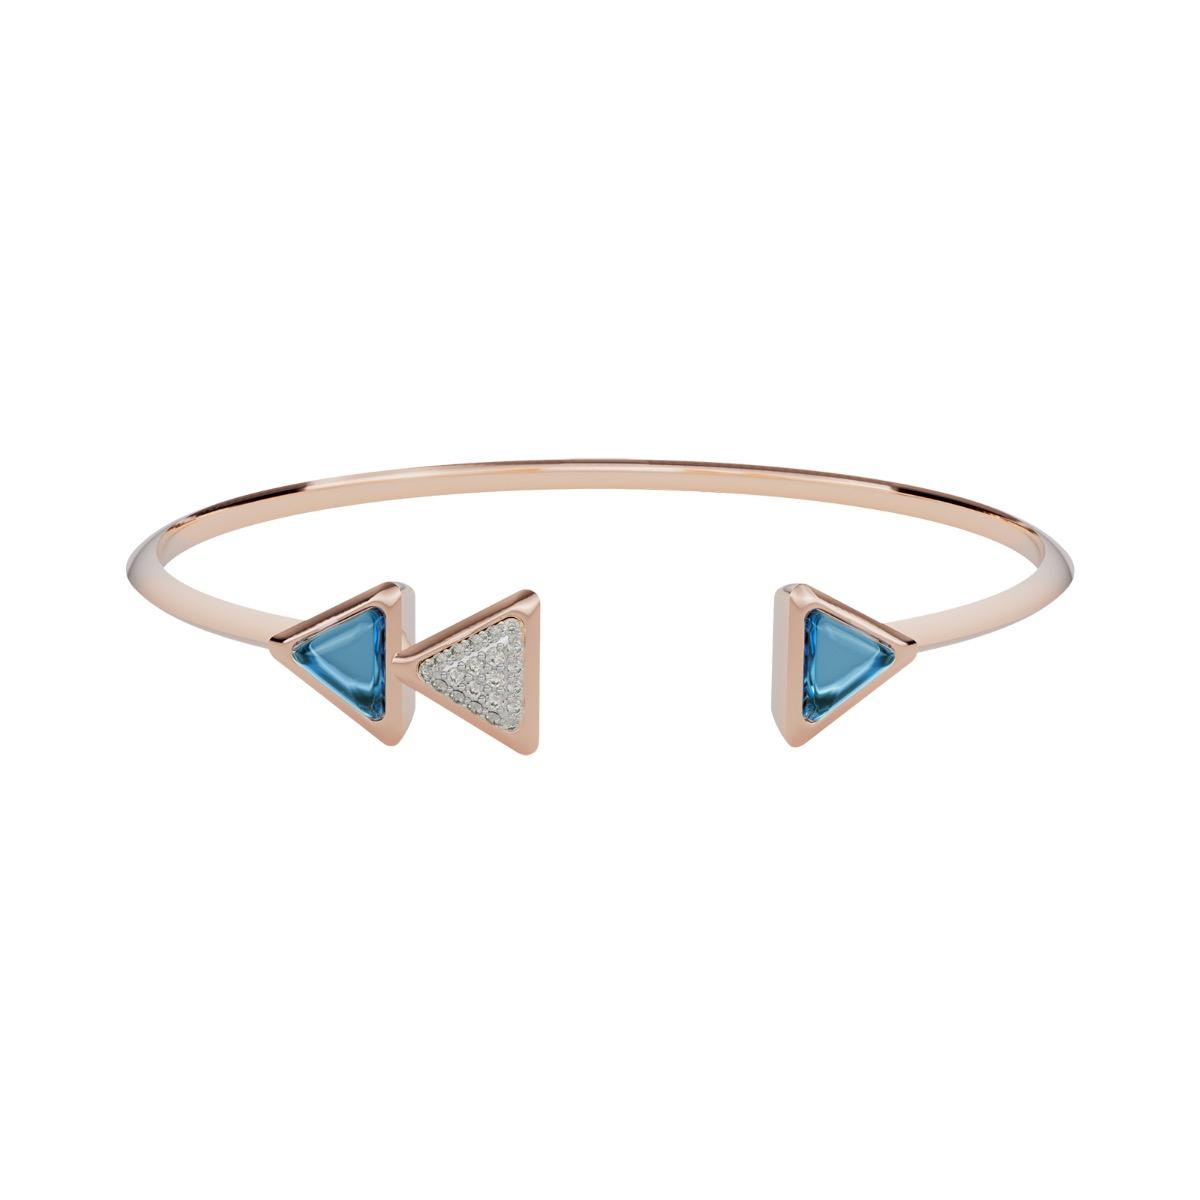 Bracelet Dove Vai Rewind Exquisite White Gold Blue Topaz and Diamonds